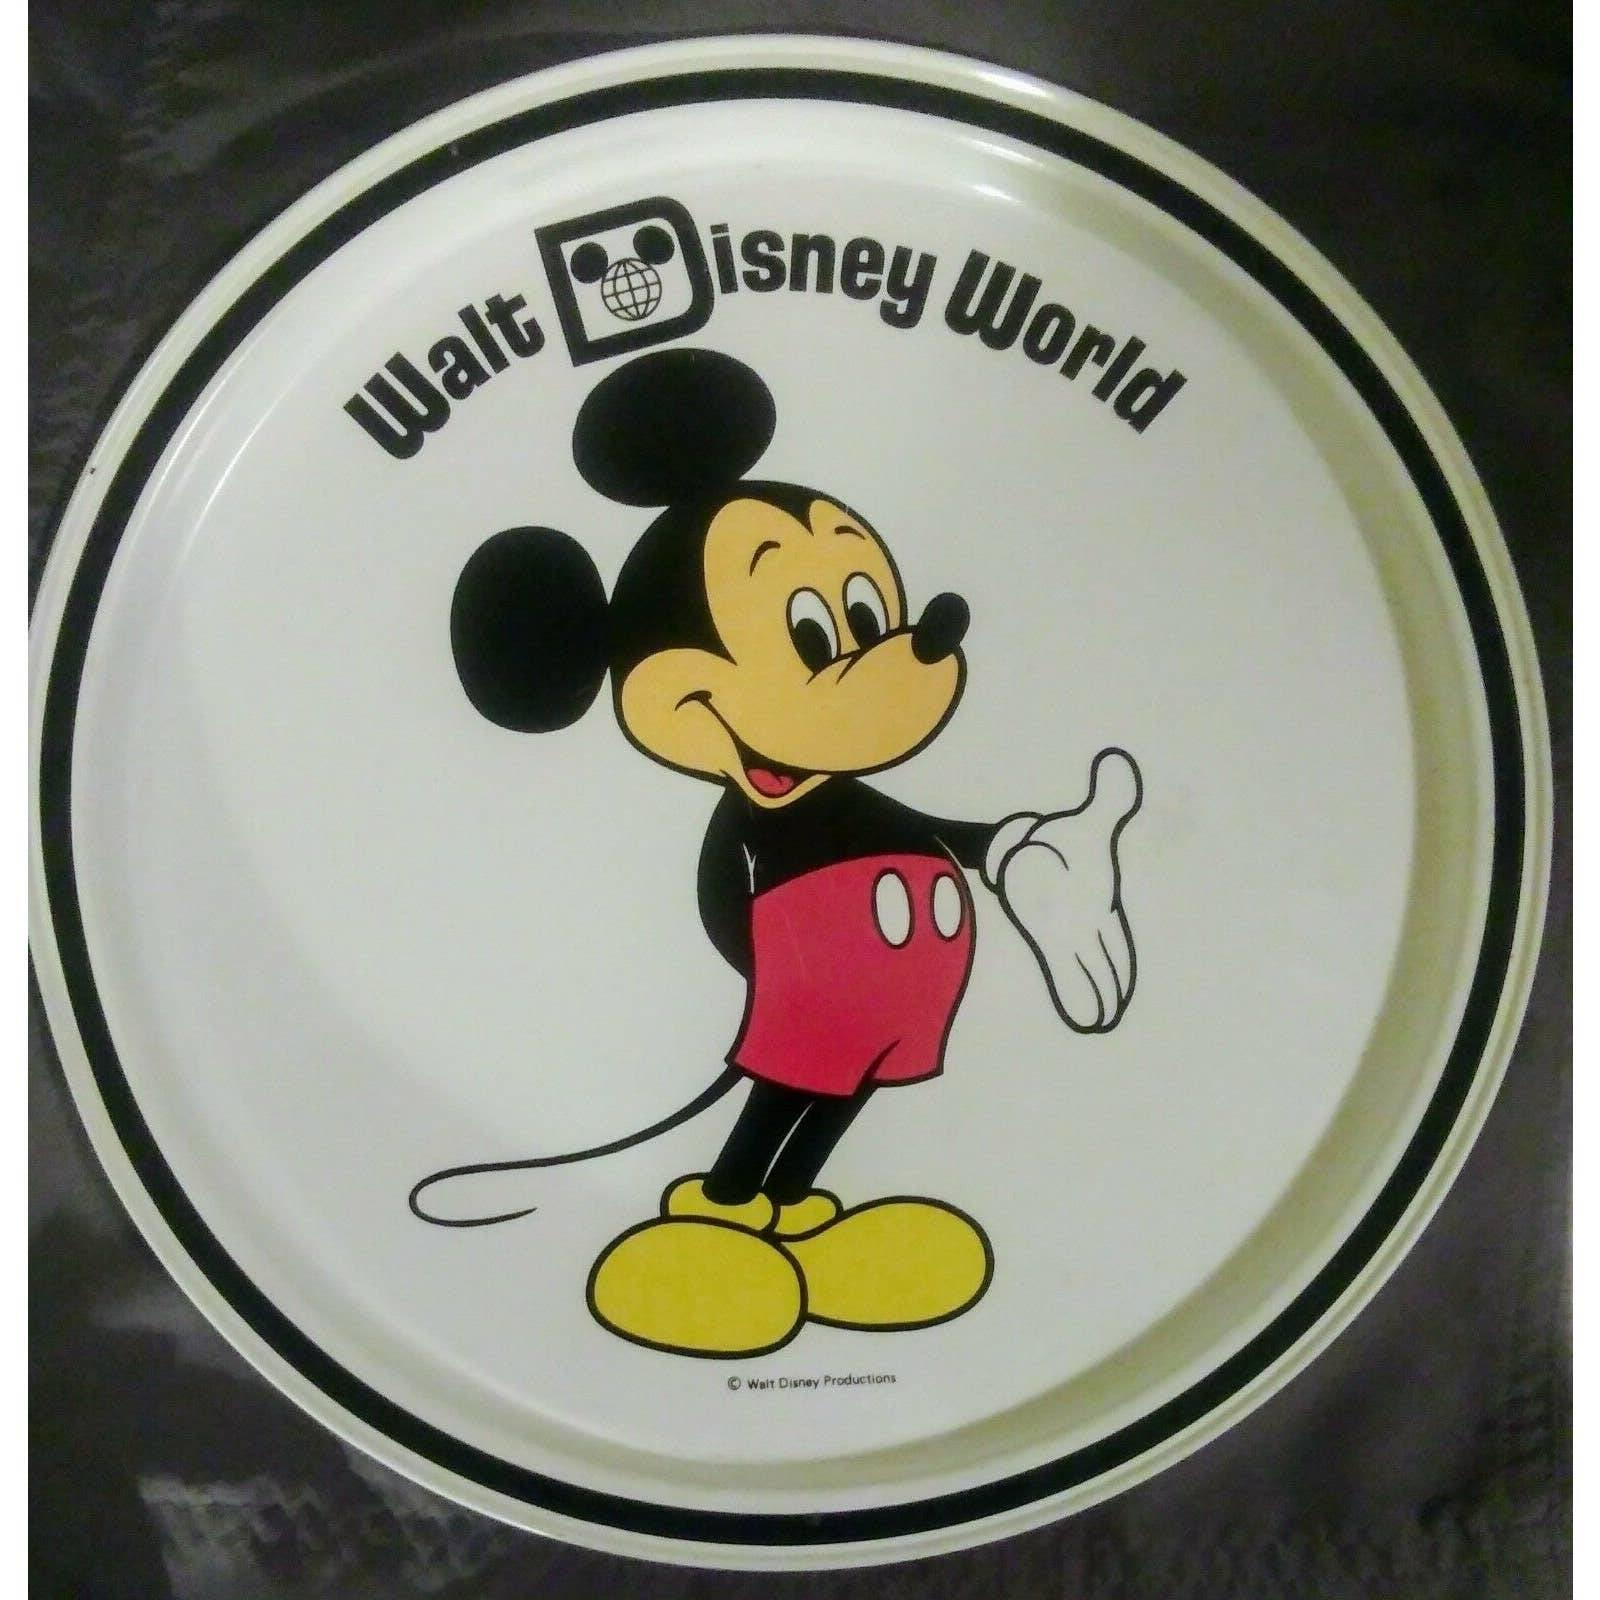 Walt Disney World Souvenir Tin Tray